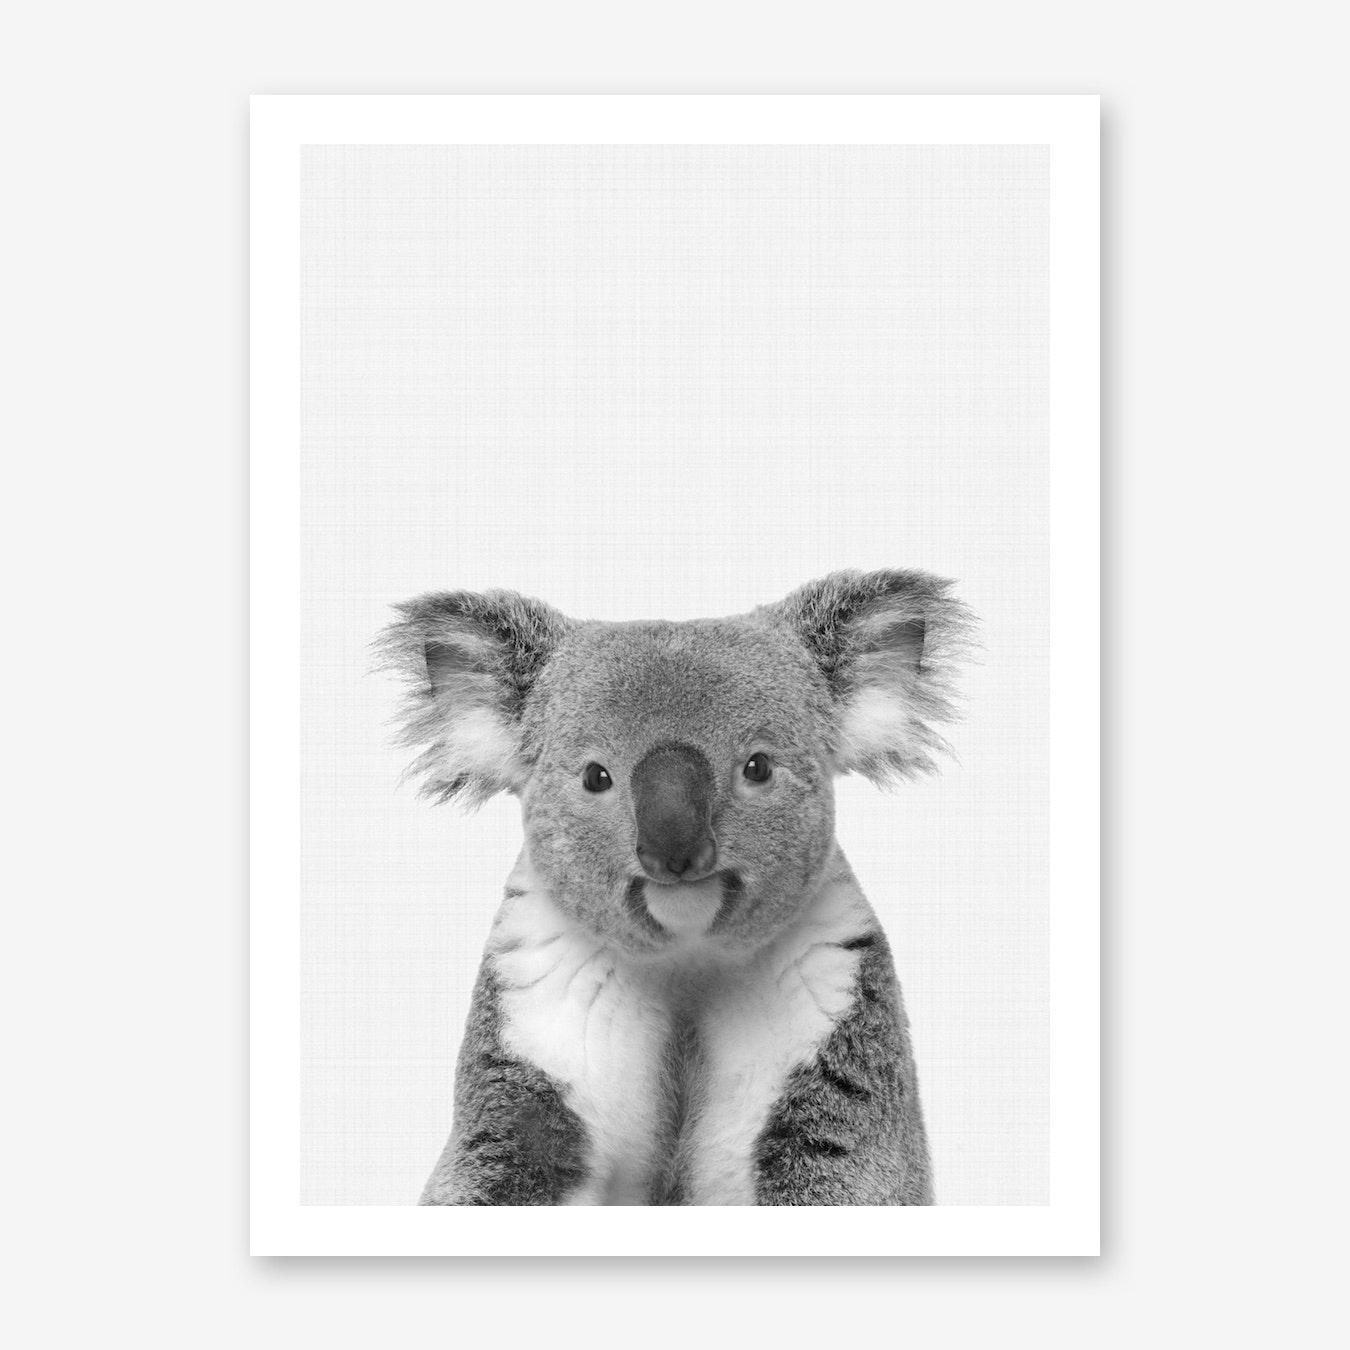 Koala Portrait Wall Art Print Free Shipping Fy